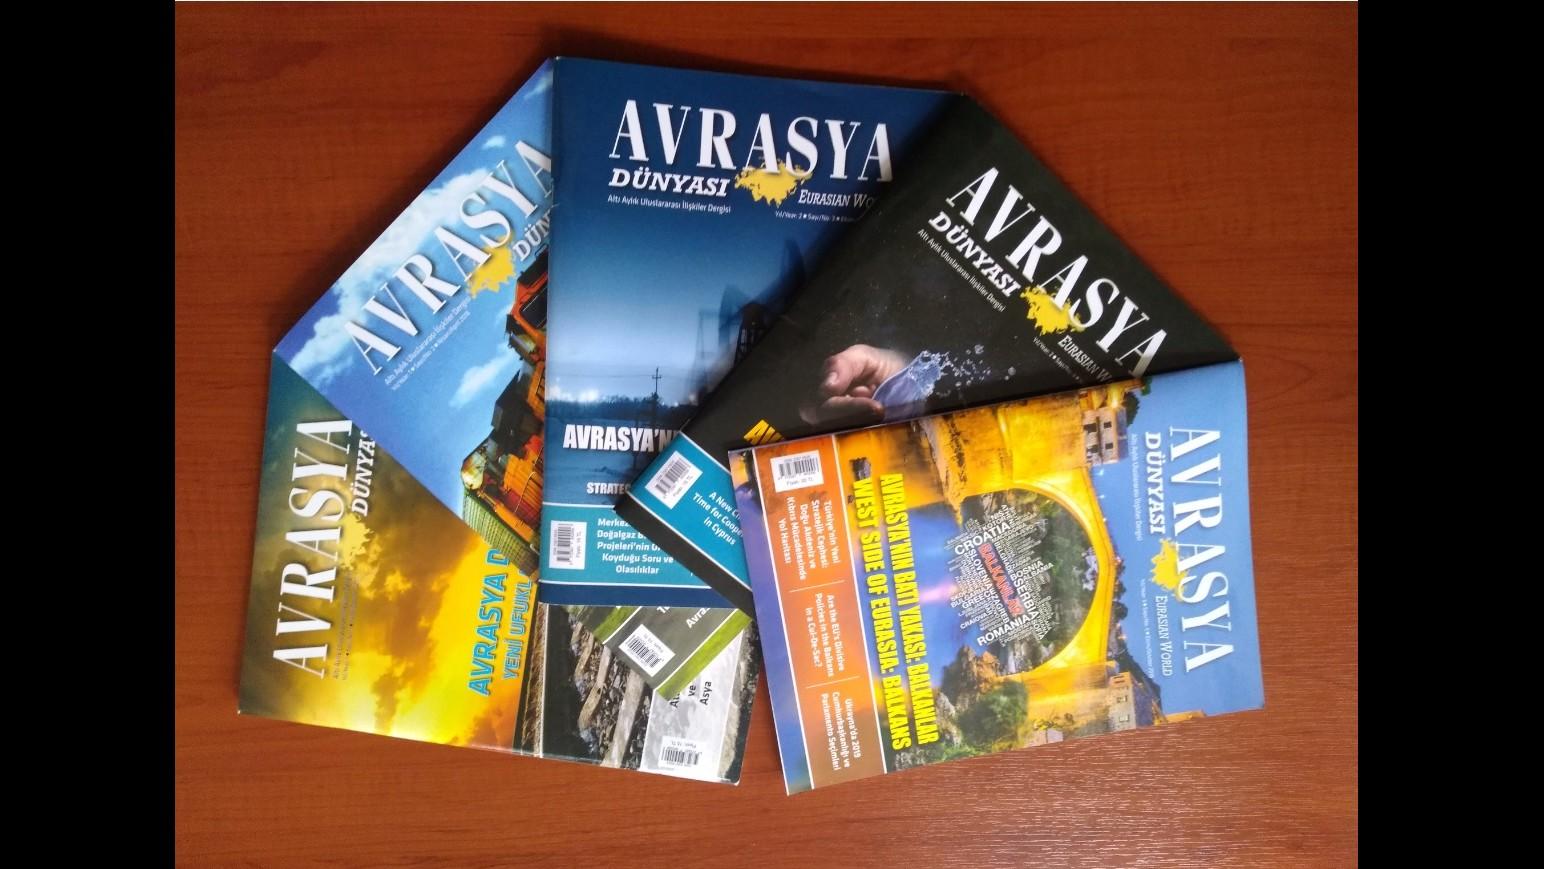 ANNOUNCEMENT: AVRASYA DÜNYASI / EURASIAN WORLD - CALL FOR PAPERS